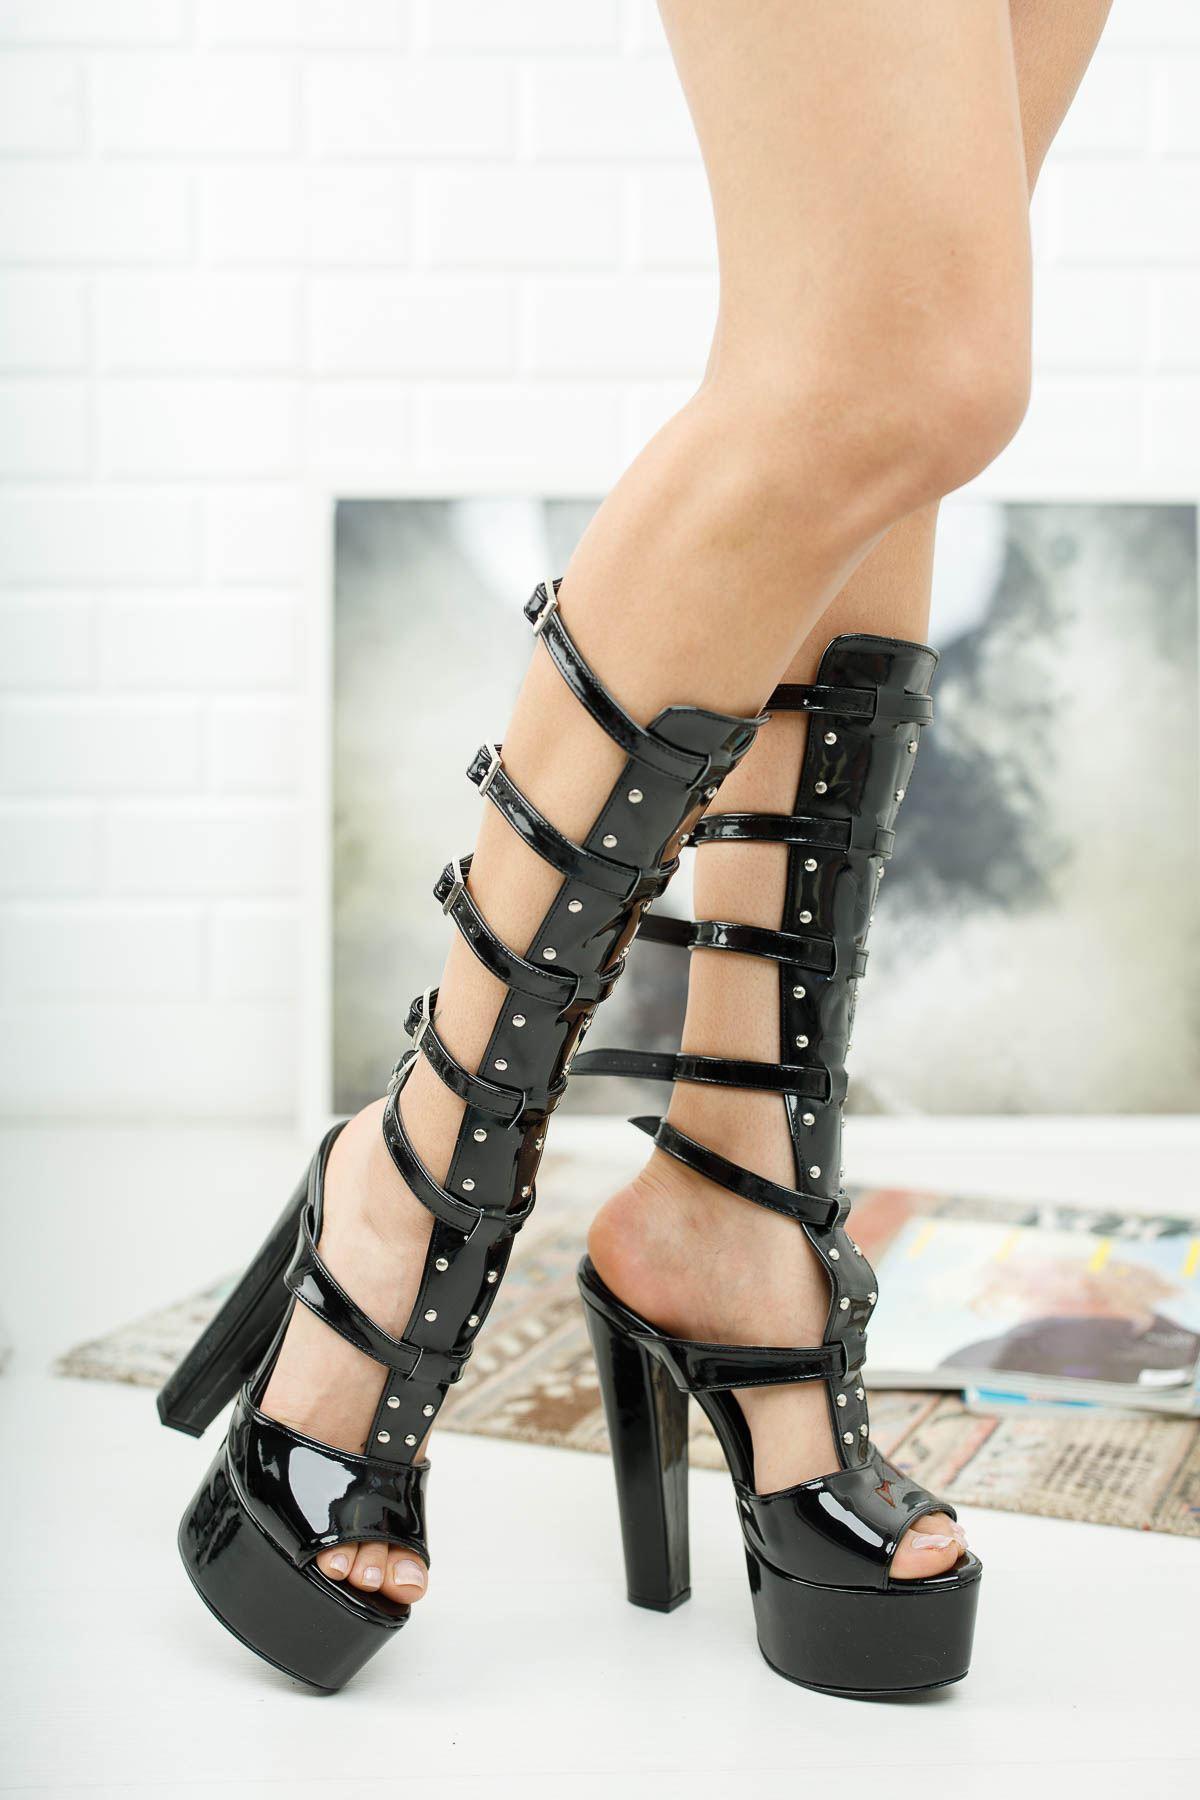 Lesvas Siyah Rugan Yüksek Topuklu Ayakkabı